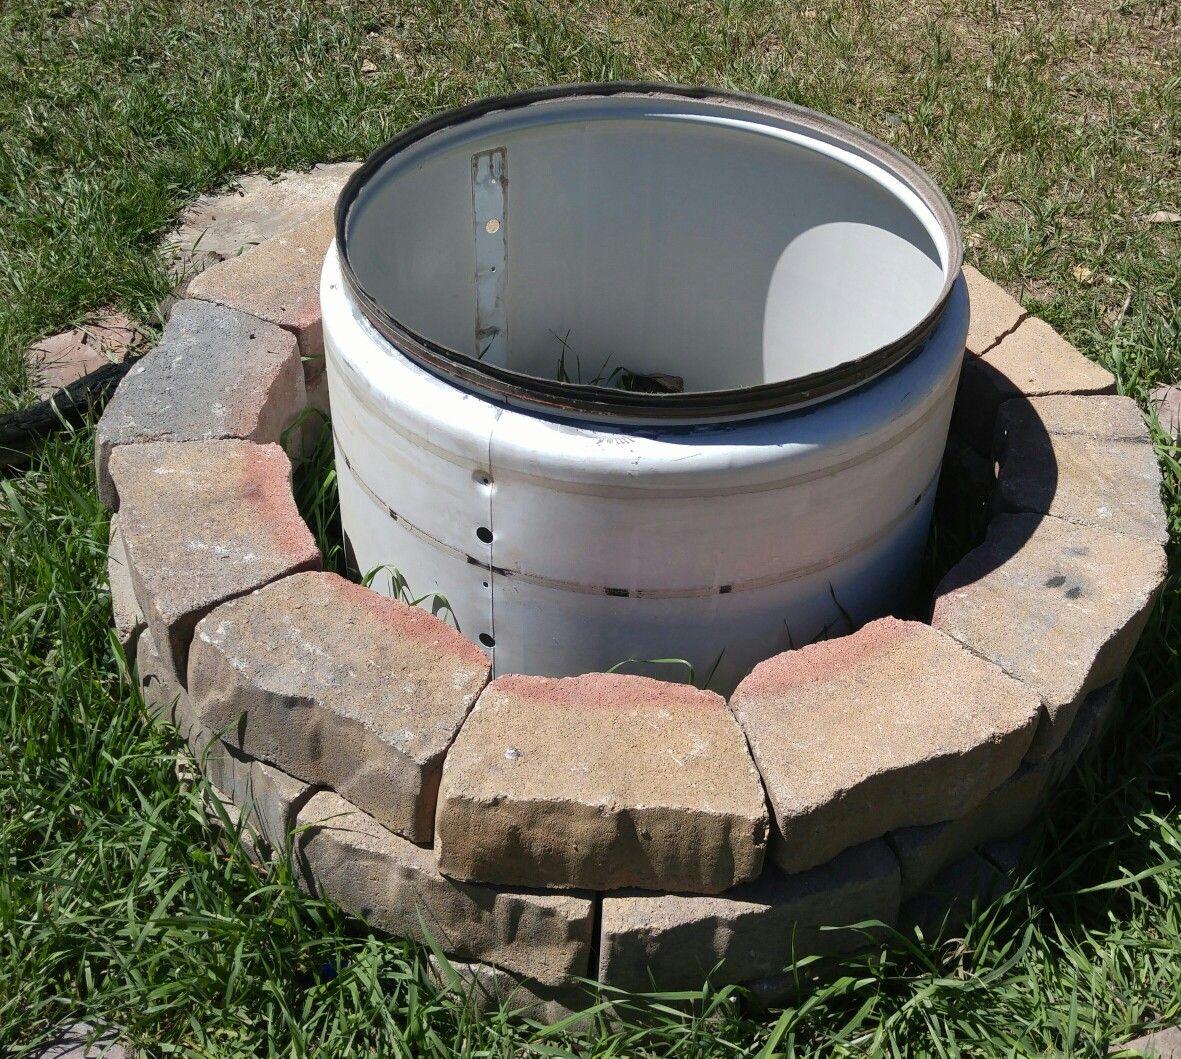 Dryer drum fire pit | Outdoor fire pit, Fire pit, Yard decor